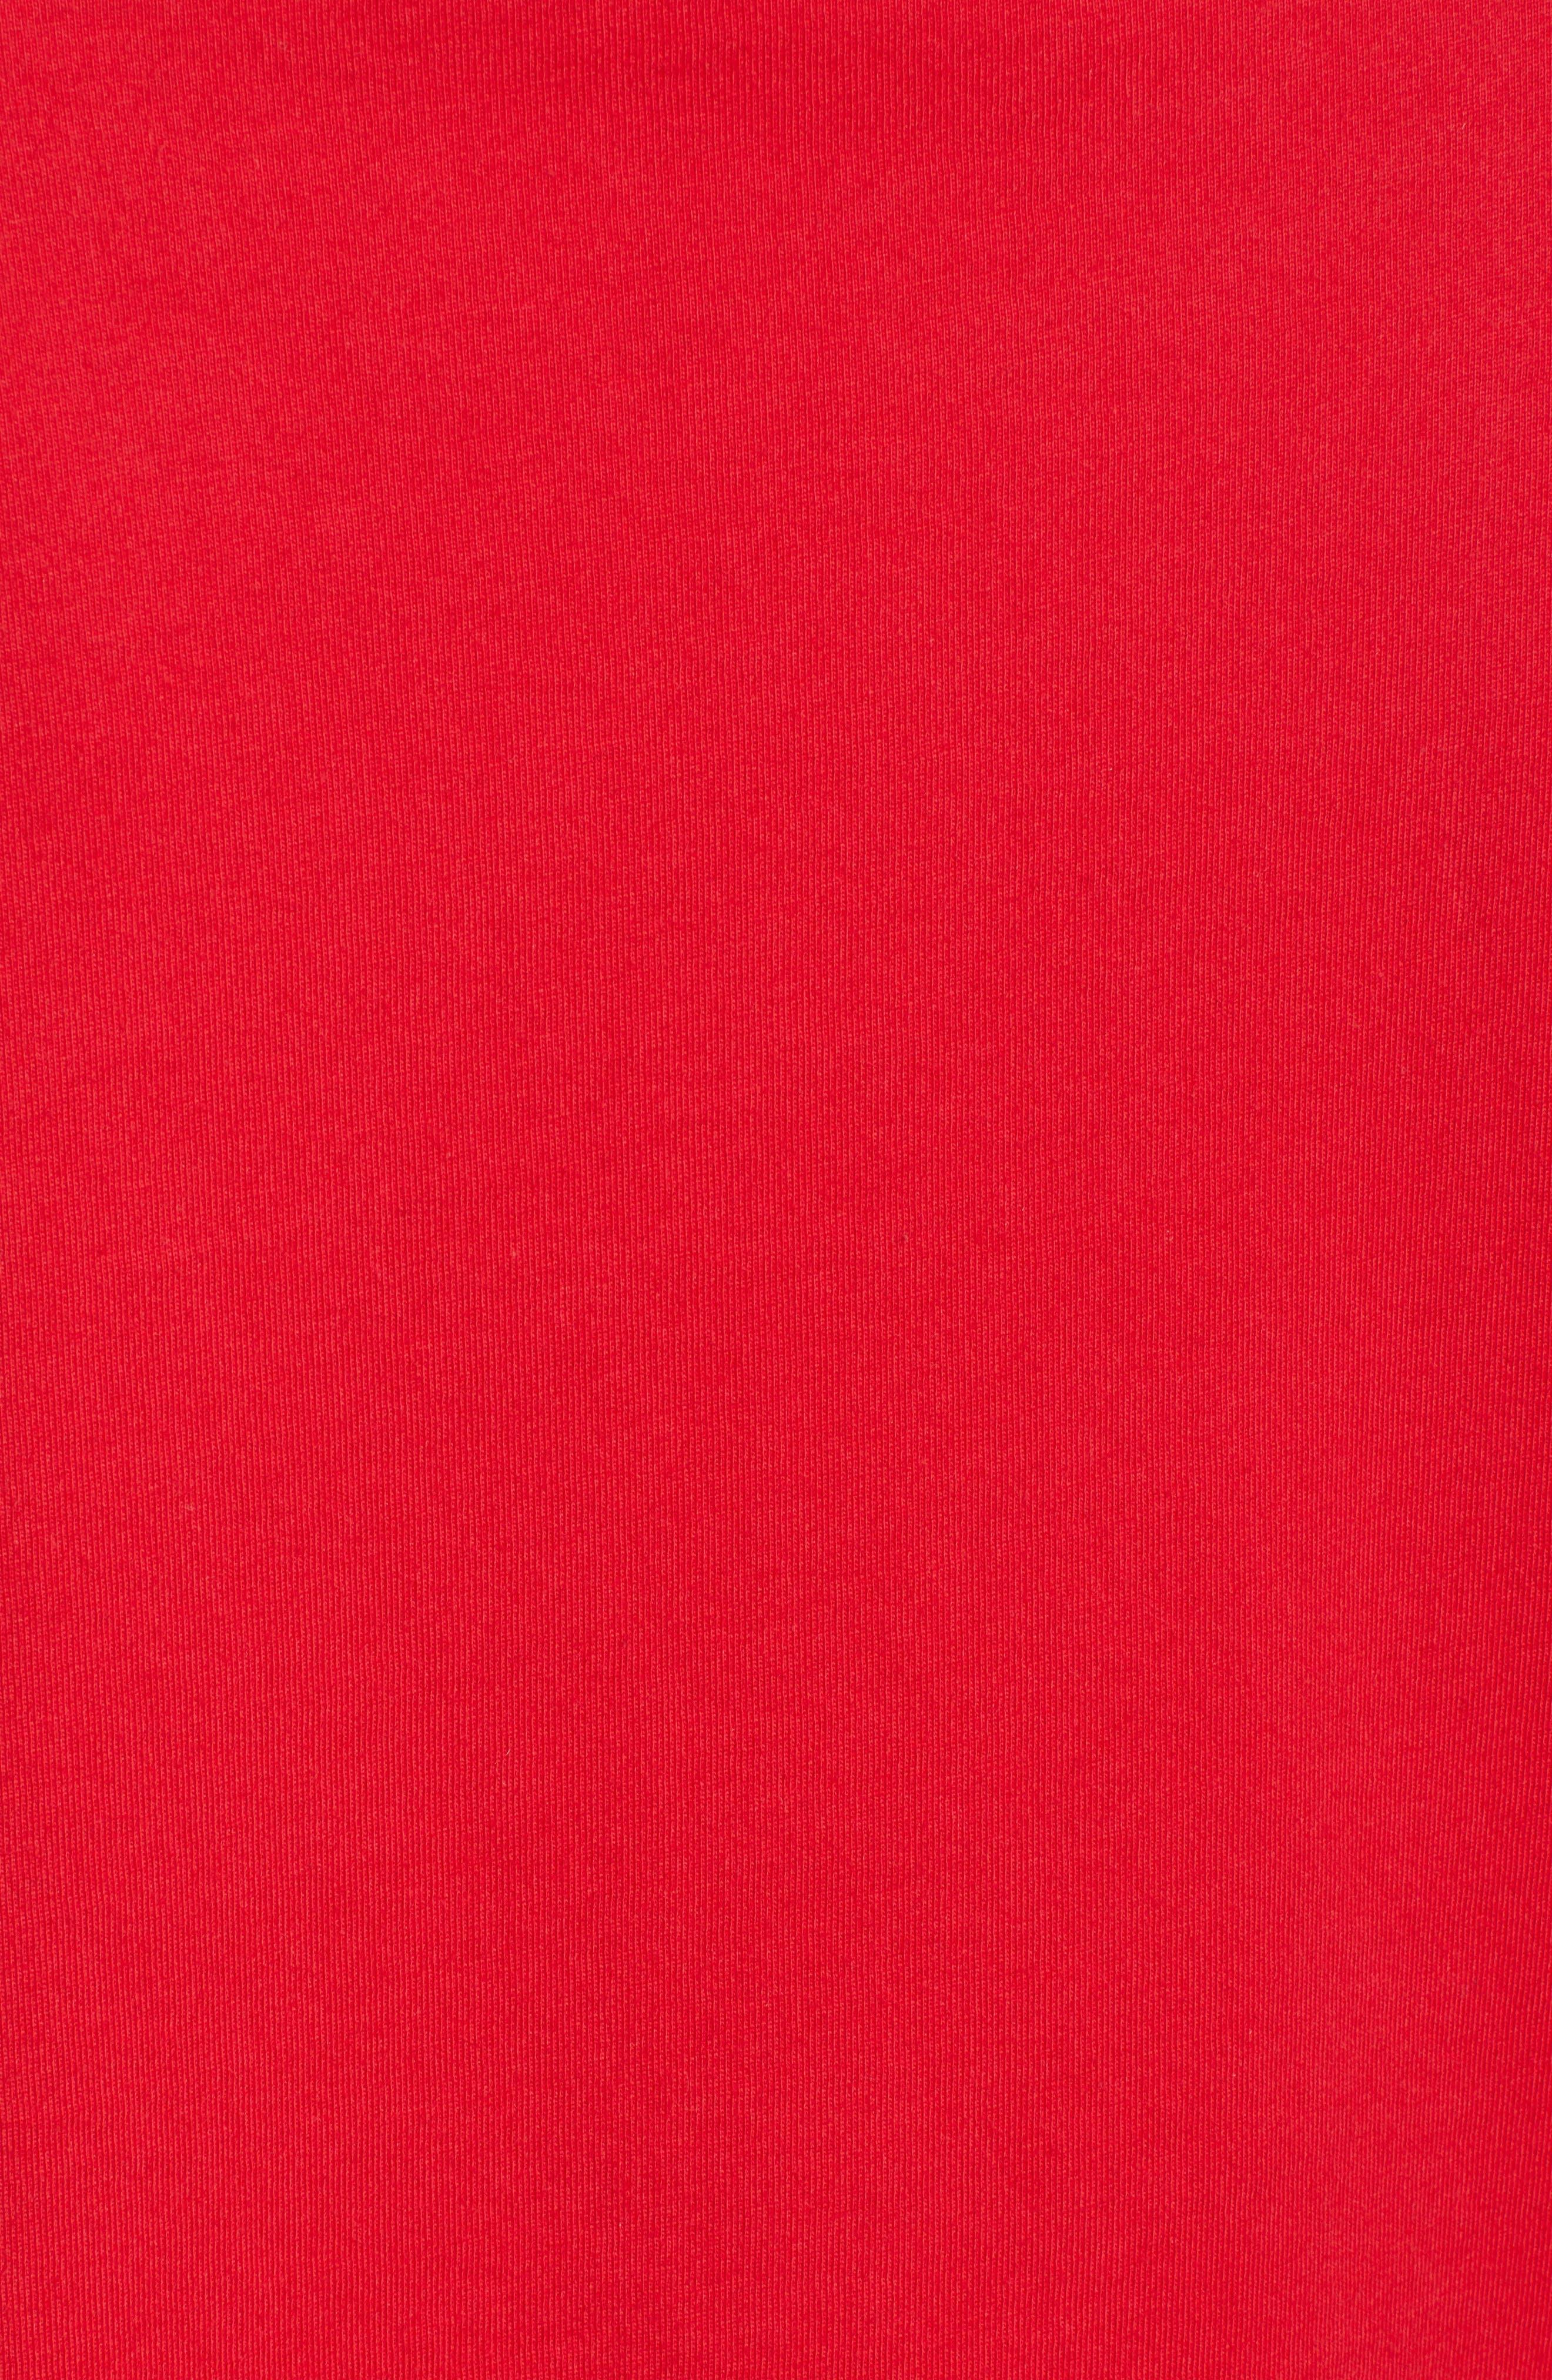 SLEEPY JONES,                             Silent Night Tee,                             Alternate thumbnail 5, color,                             RED